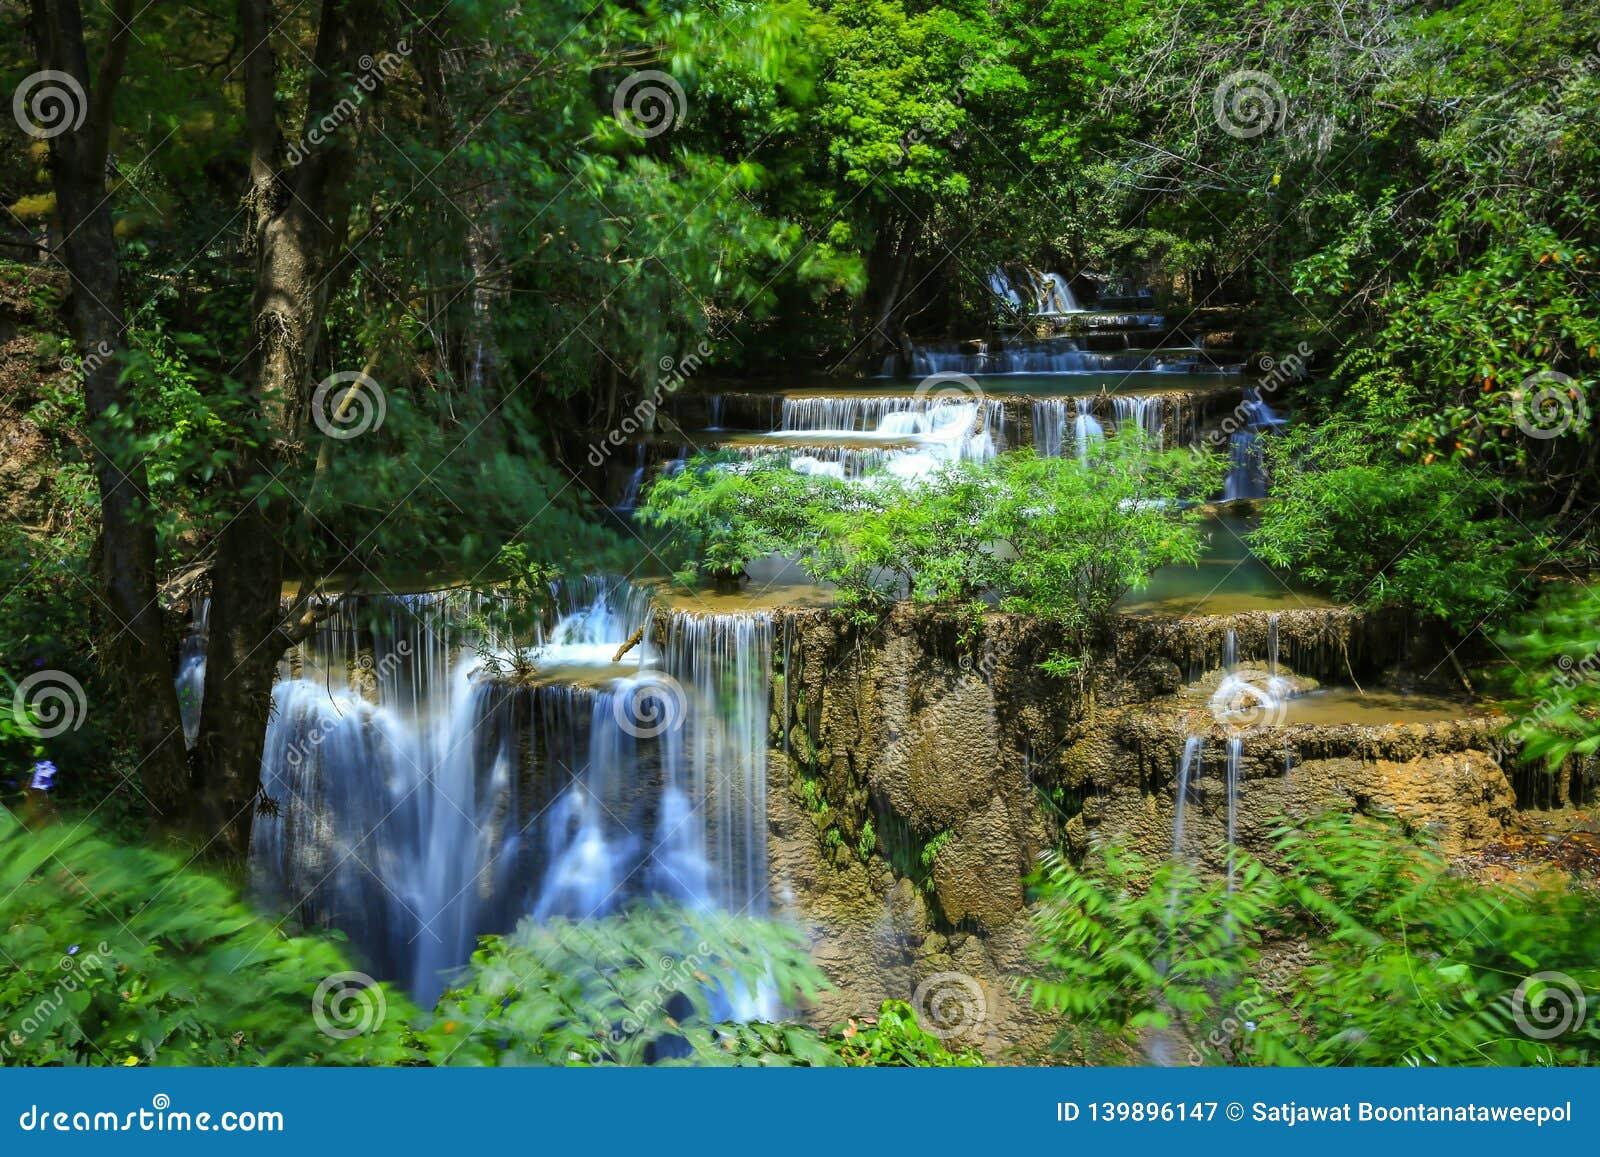 Национальный парк Kanchanaburi Khuean Srinagarindra водопада Huai Mae Khamin, Таиланд